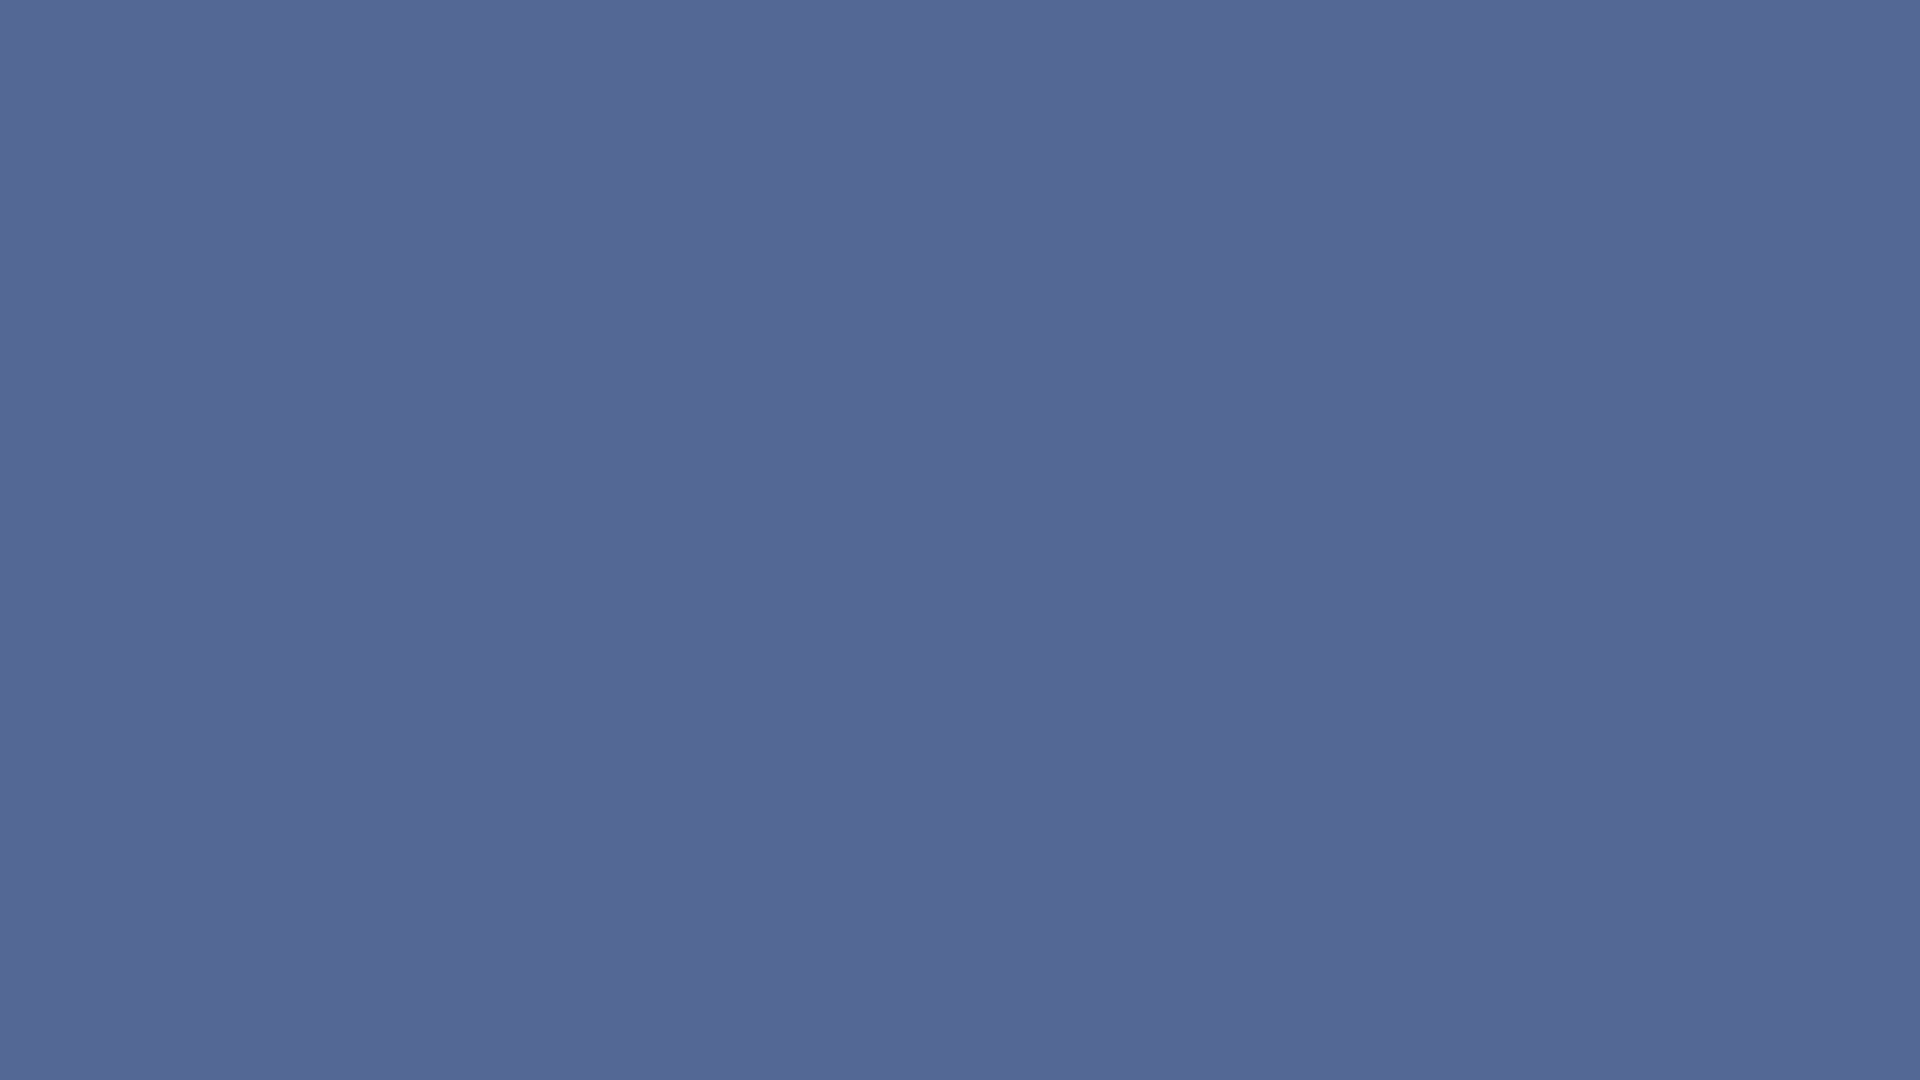 1920x1080 UCLA Blue Solid Color Background